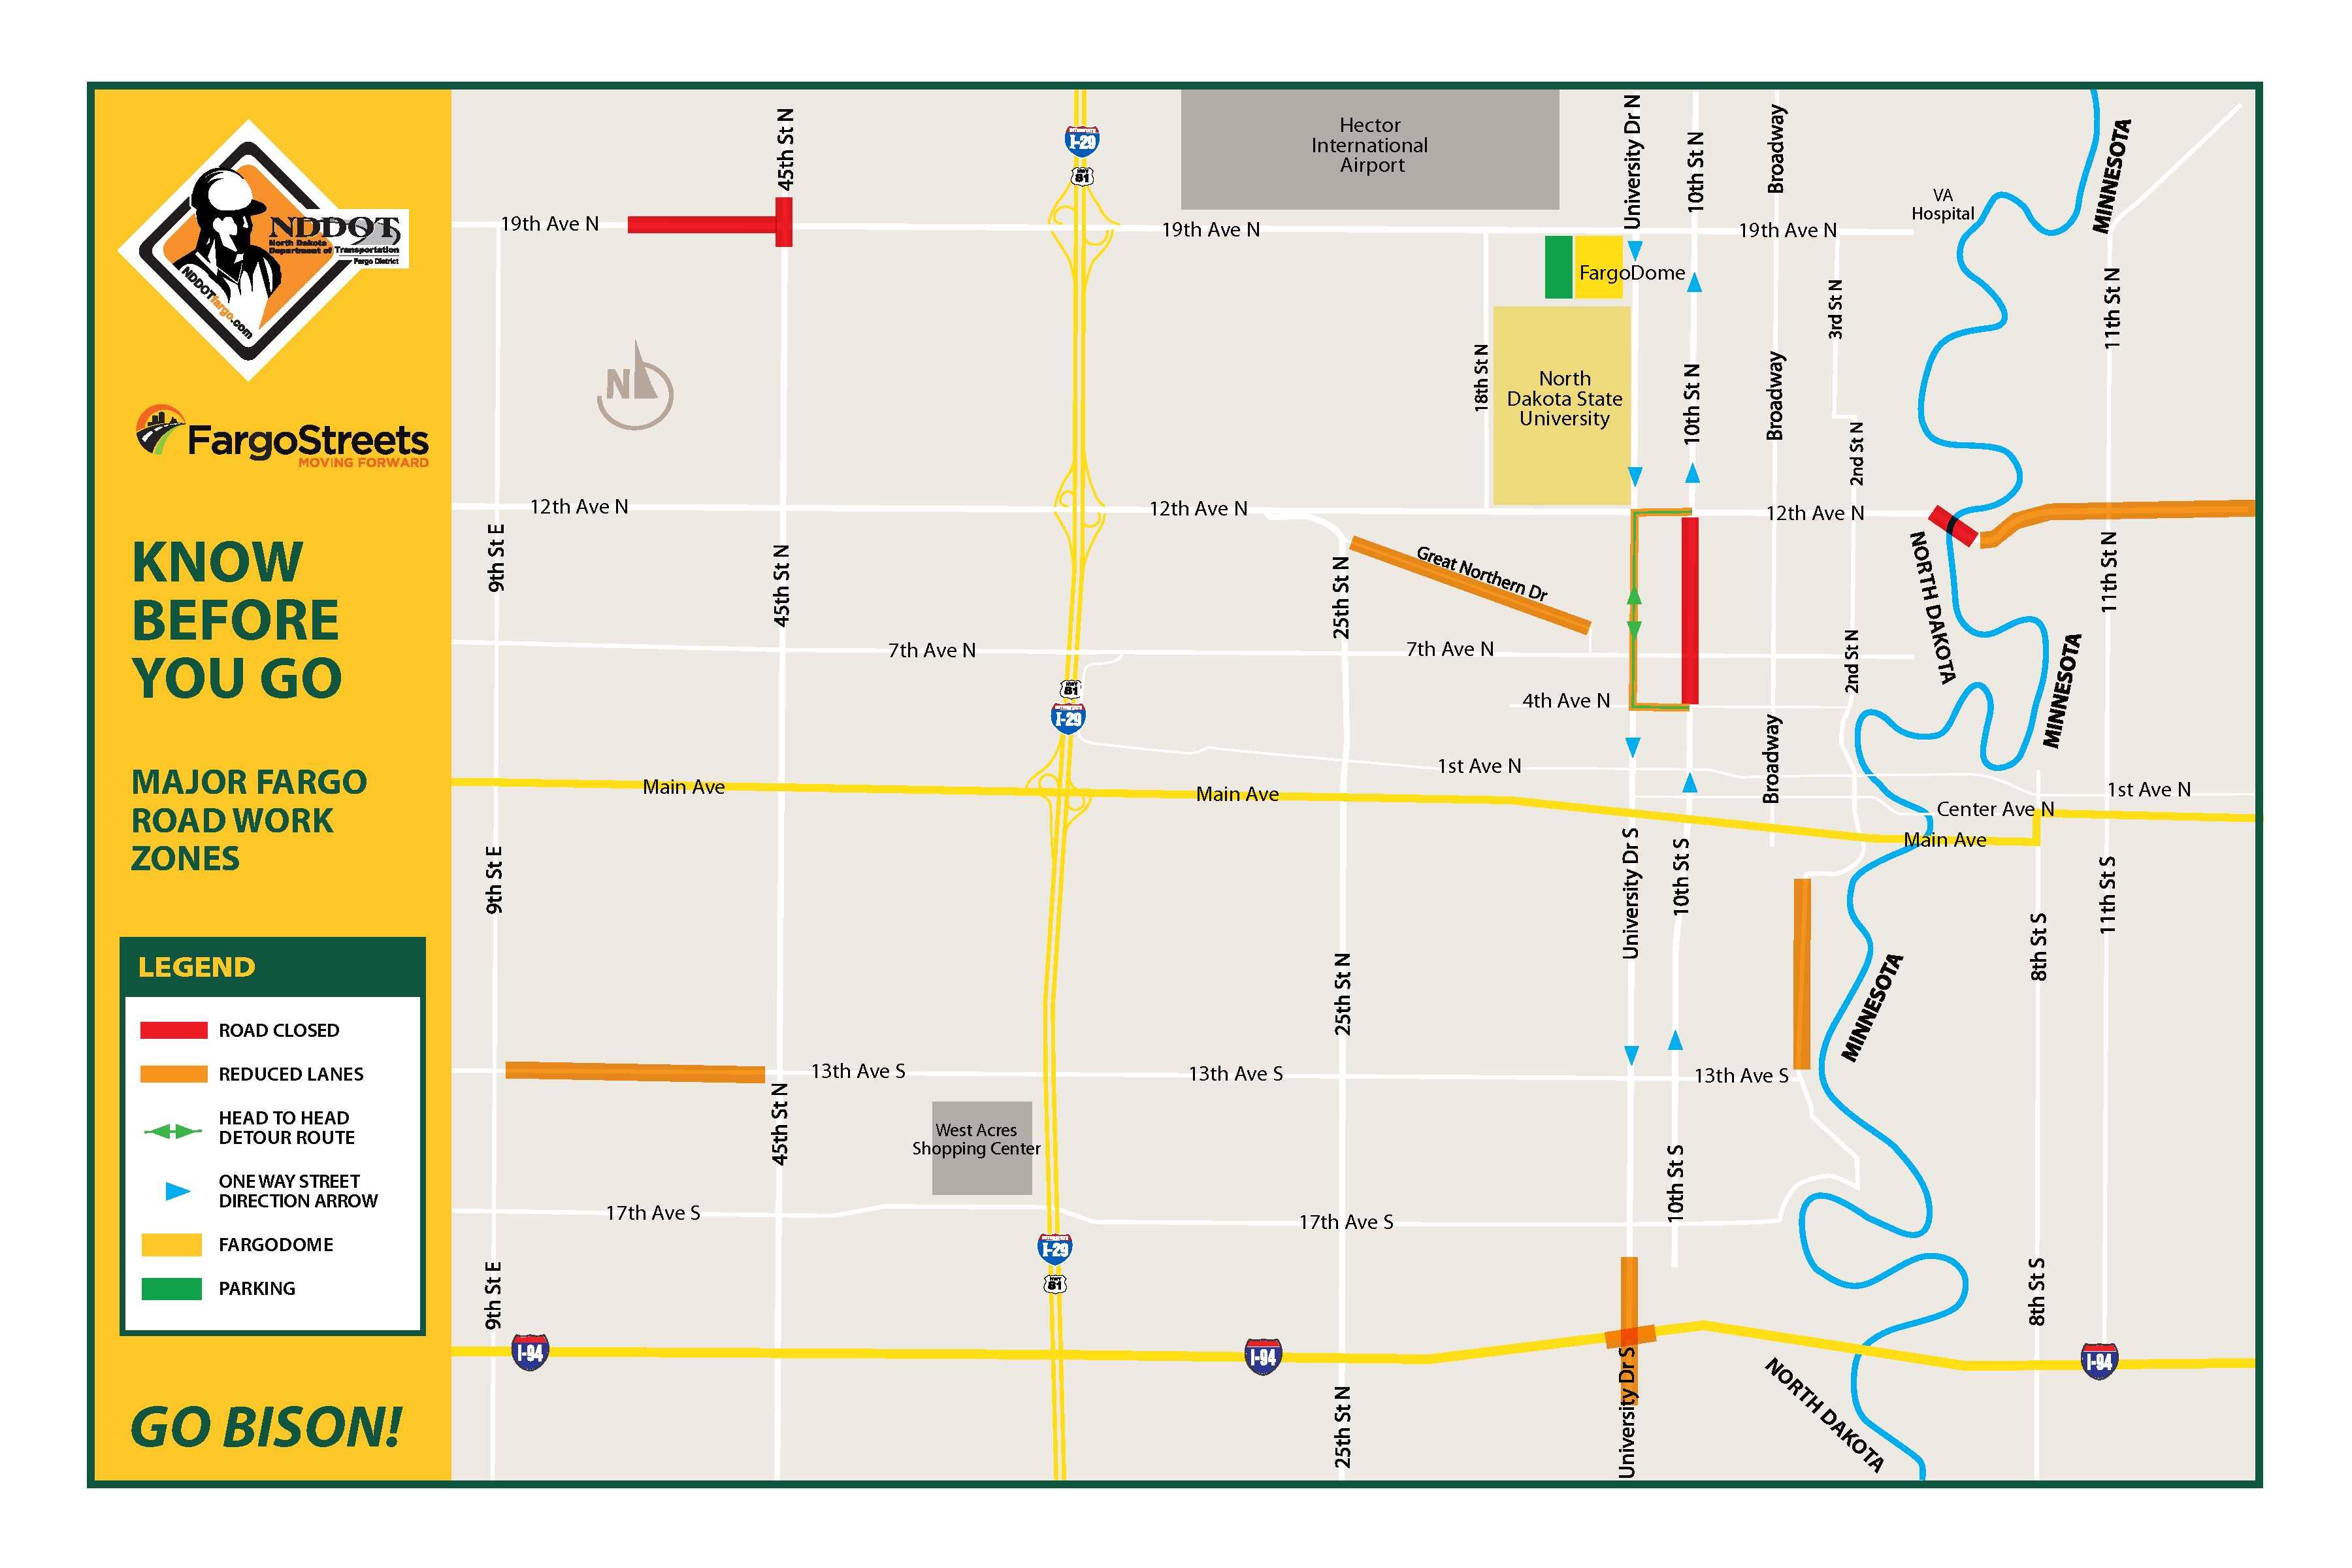 South Dakota Travel Information Map hawaii map New York City Map ...